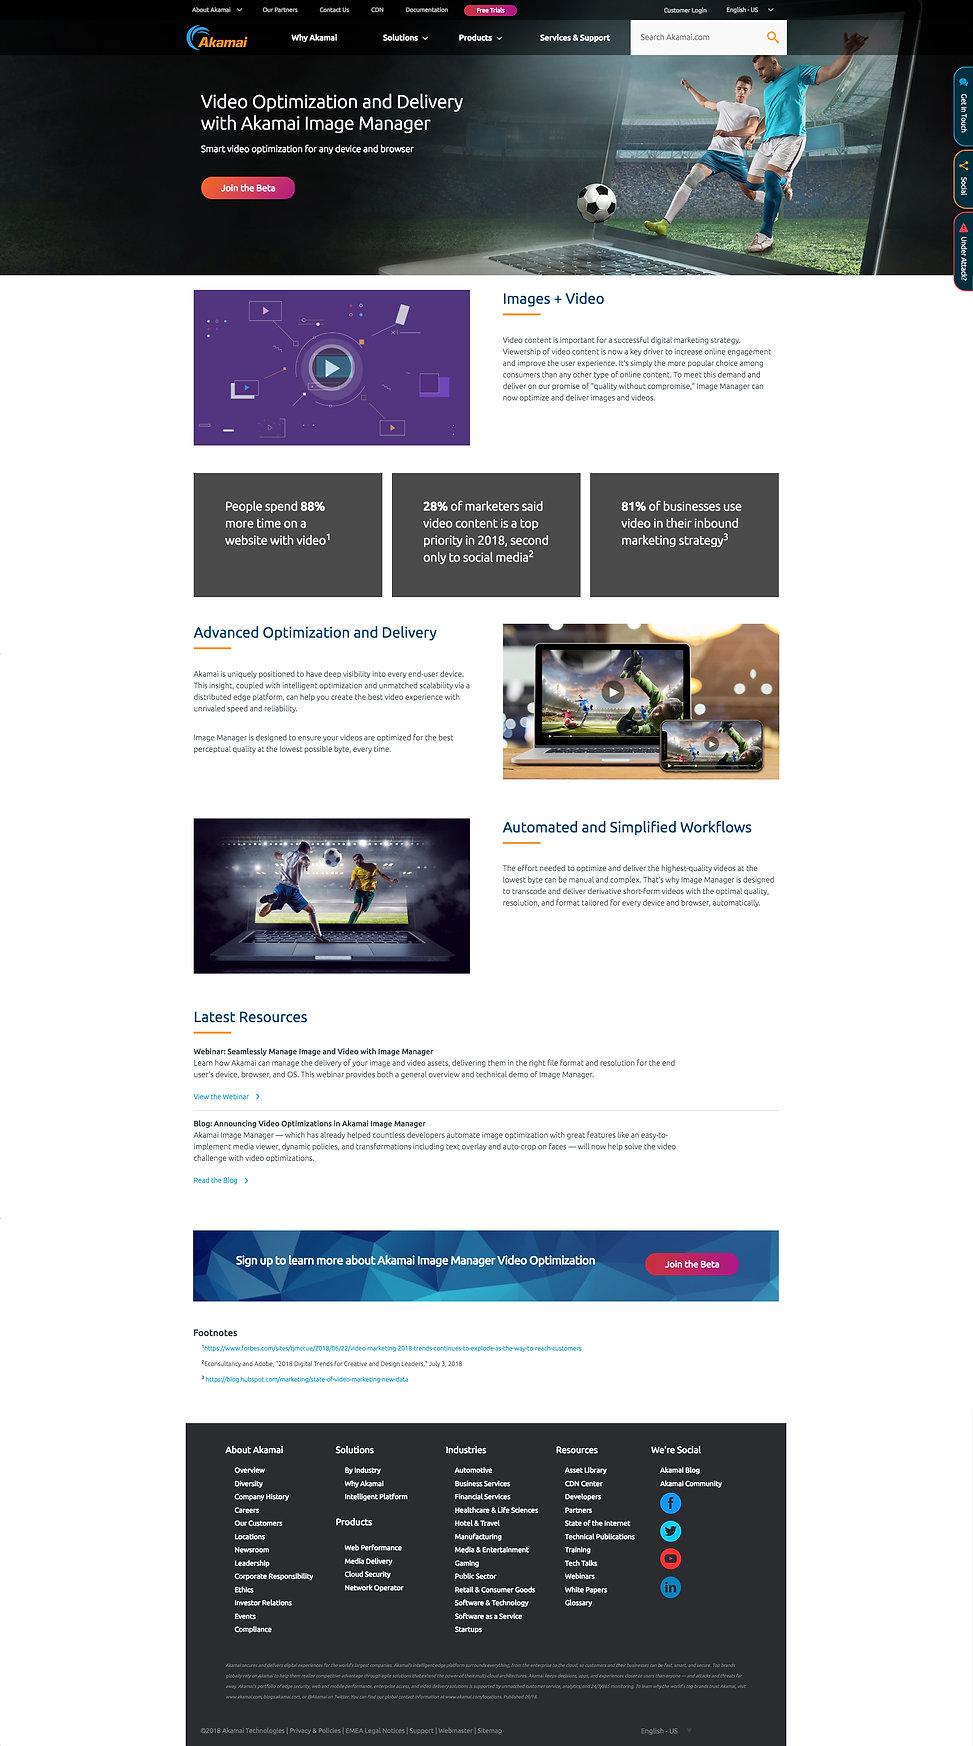 Akamai-website-layout-design.jpg